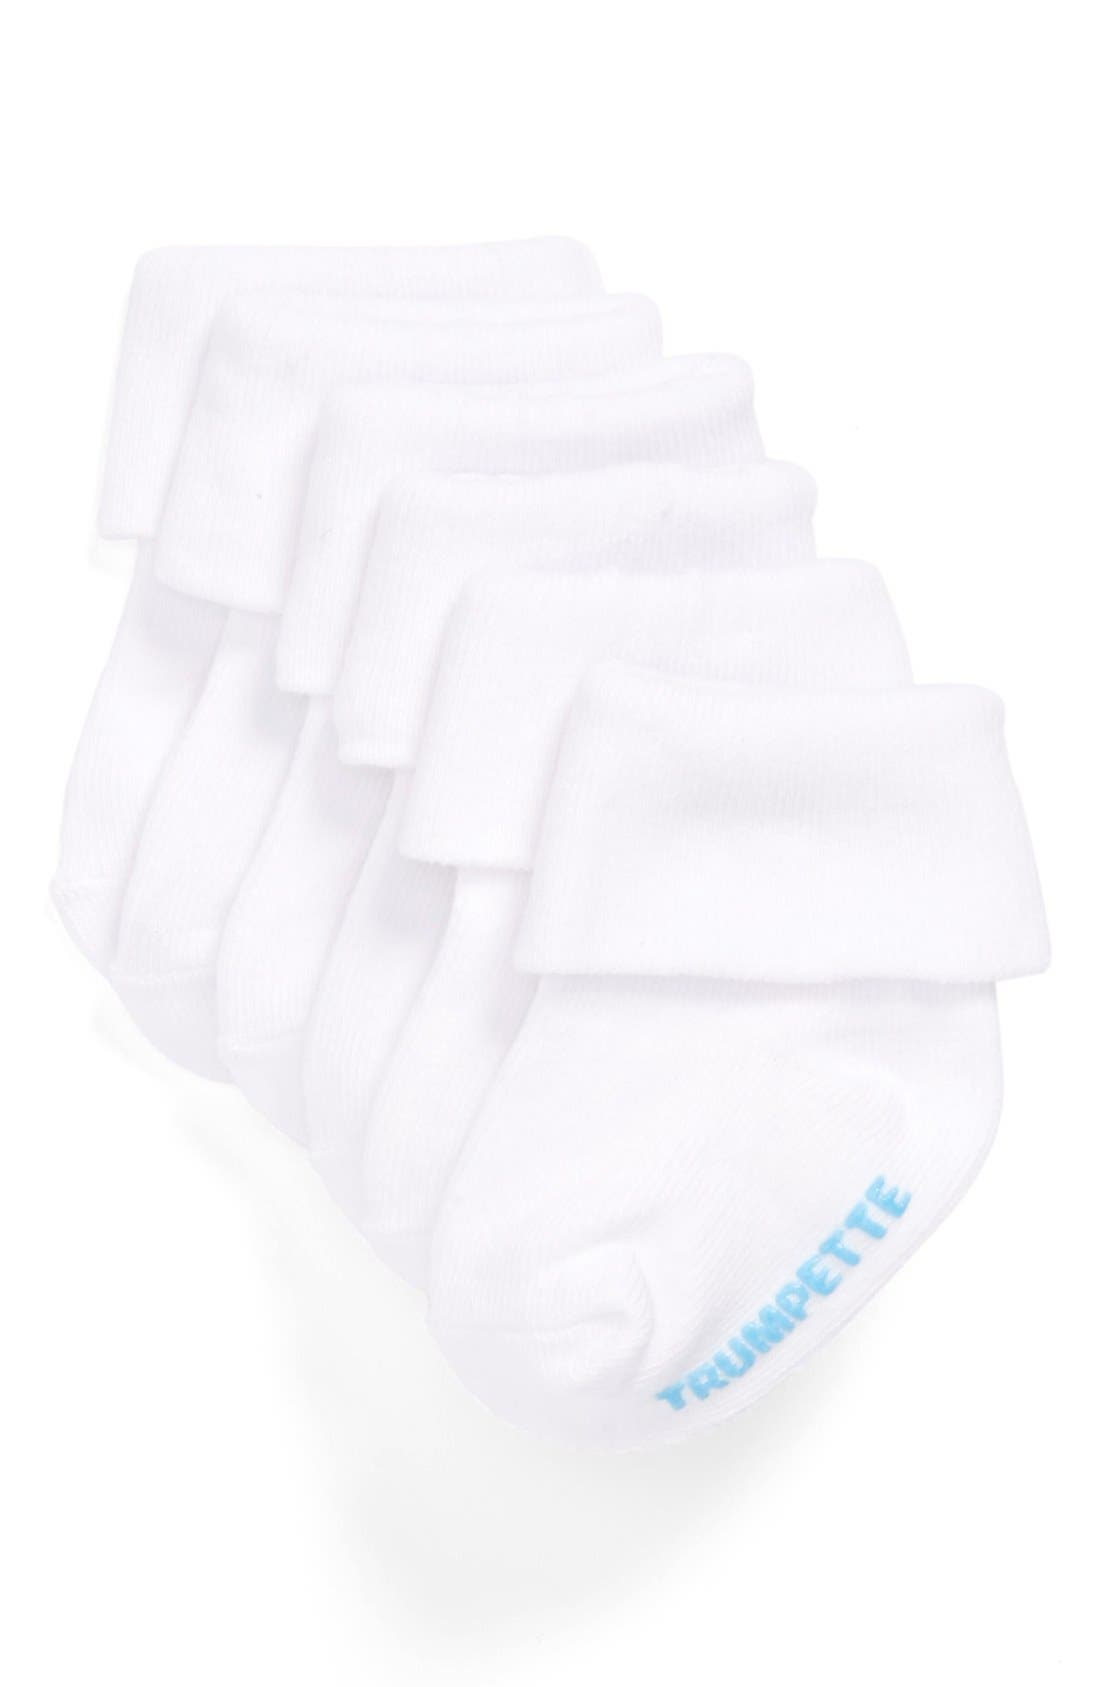 Alternate Image 1 Selected - Trumpette Socks (3-Pack) (Baby Boys)